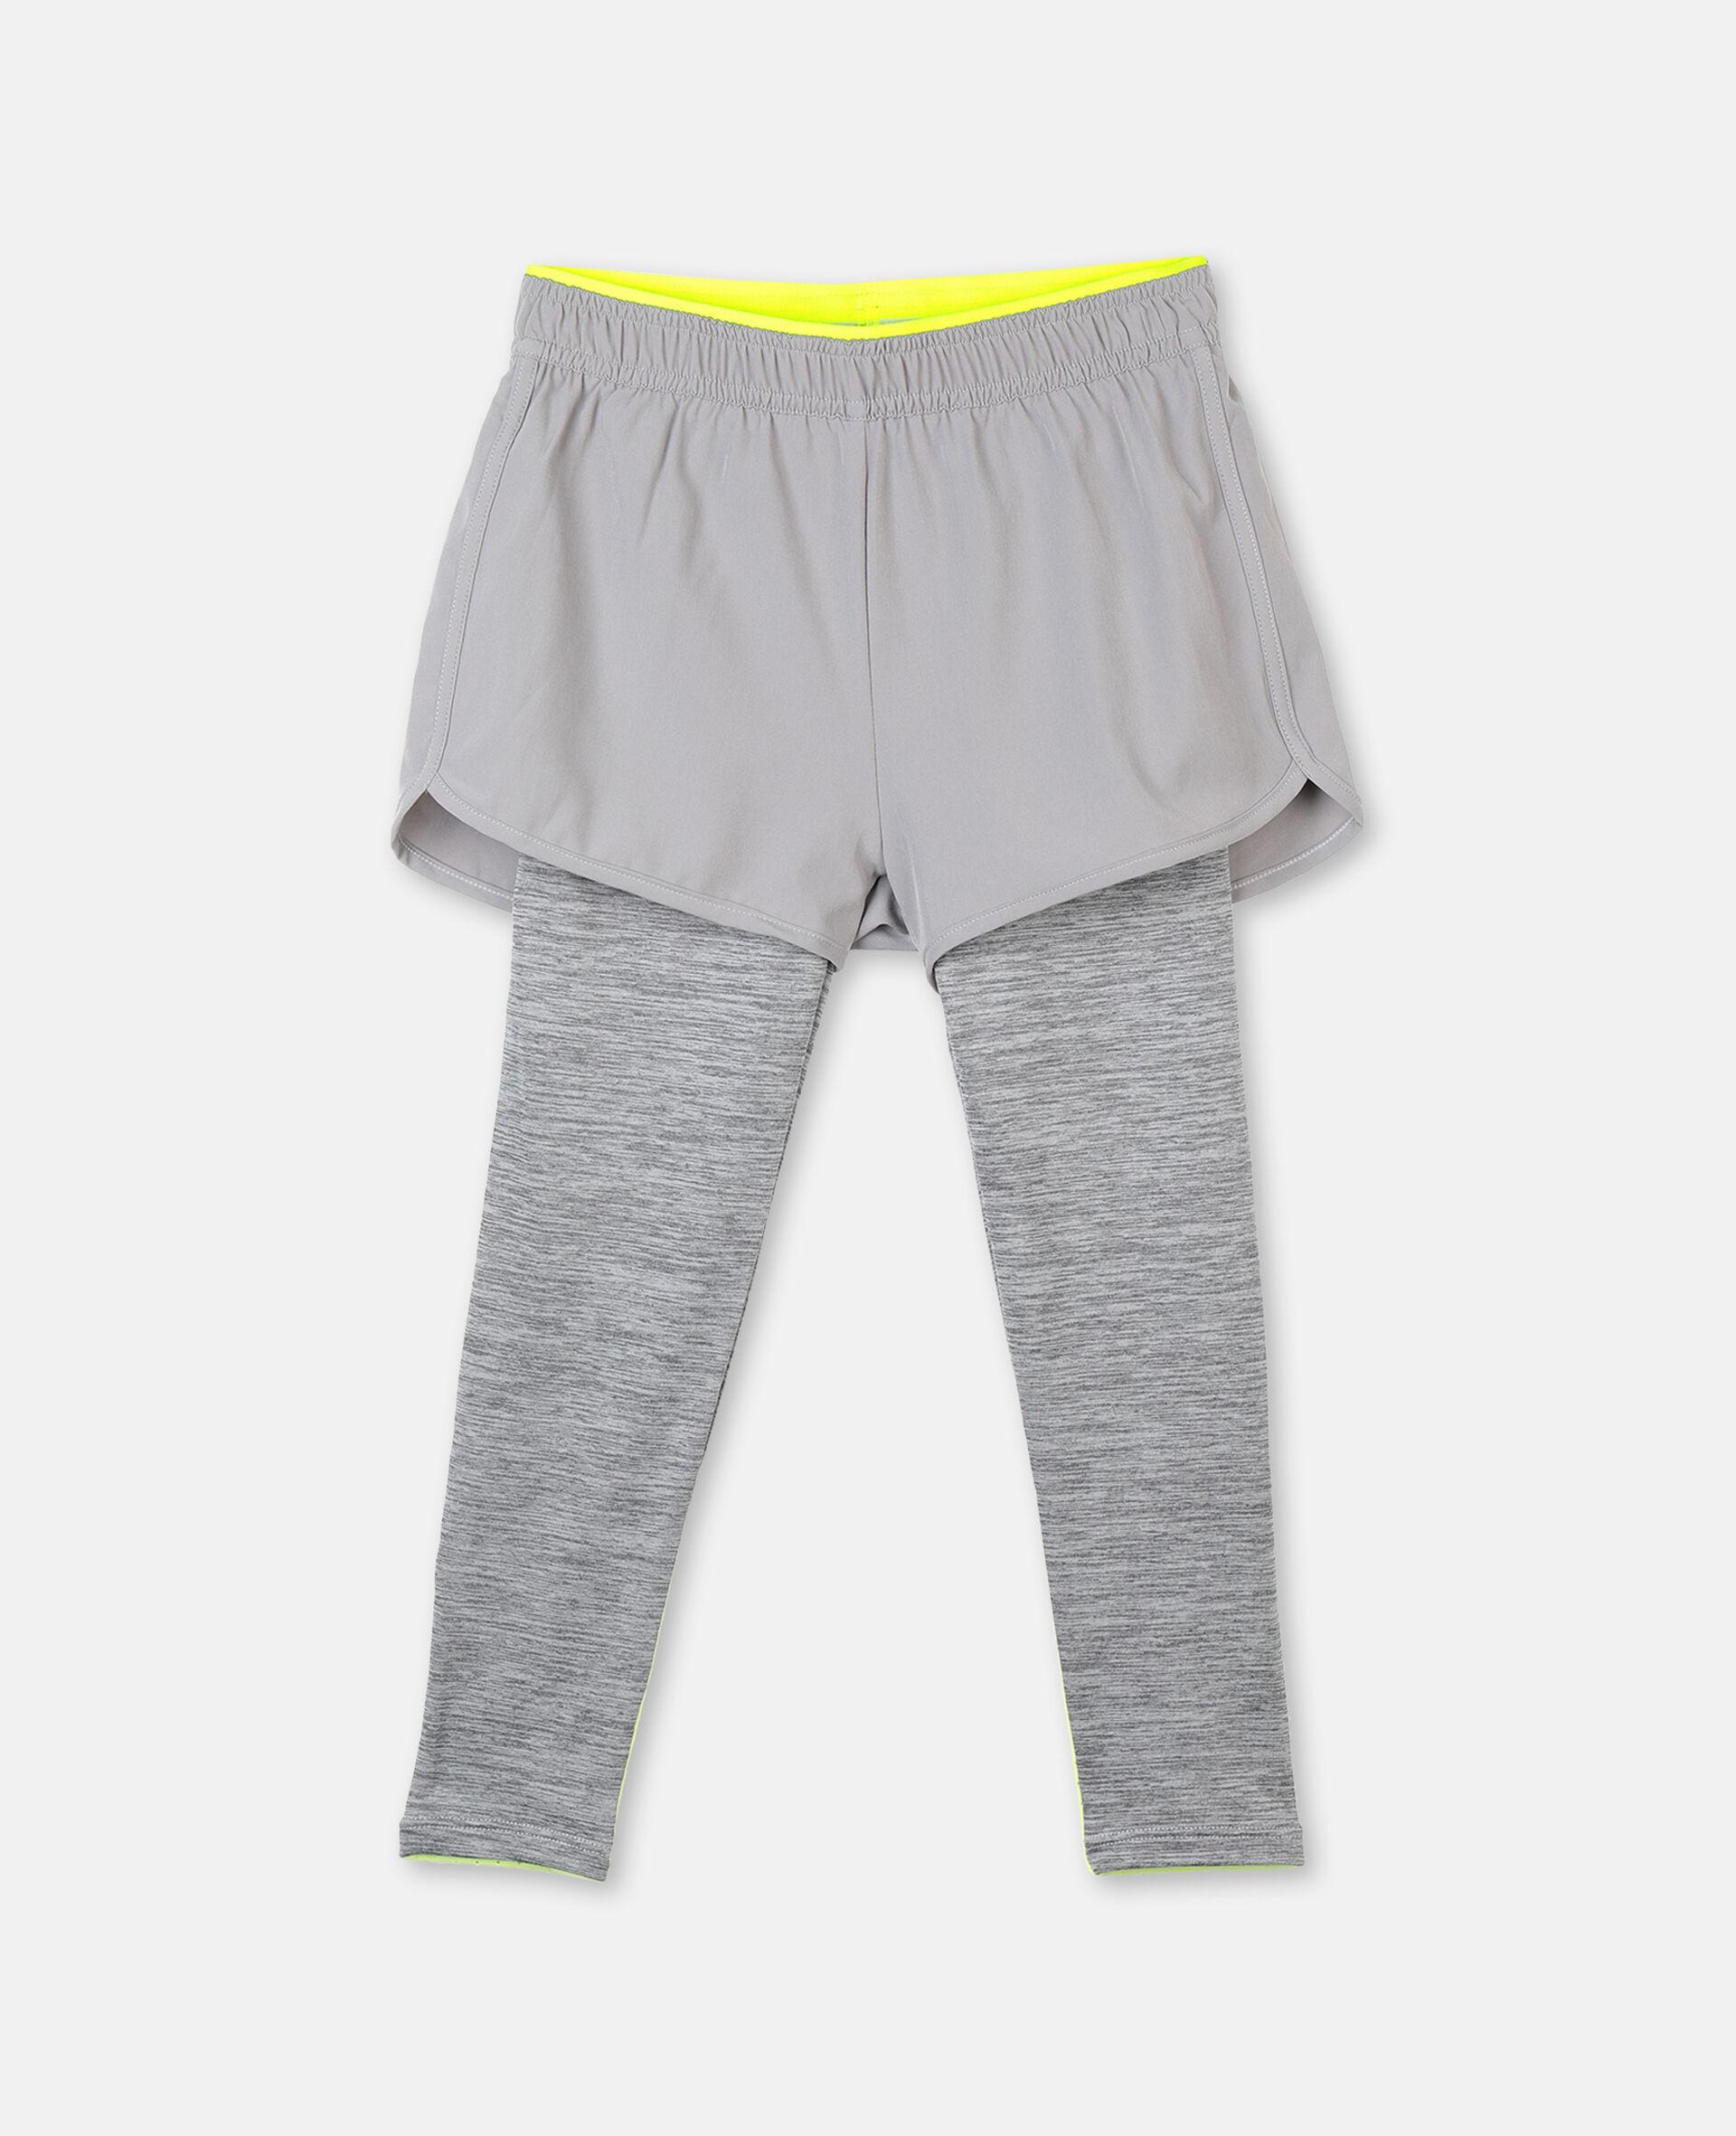 段染运动贴腿裤 -灰色-large image number 0